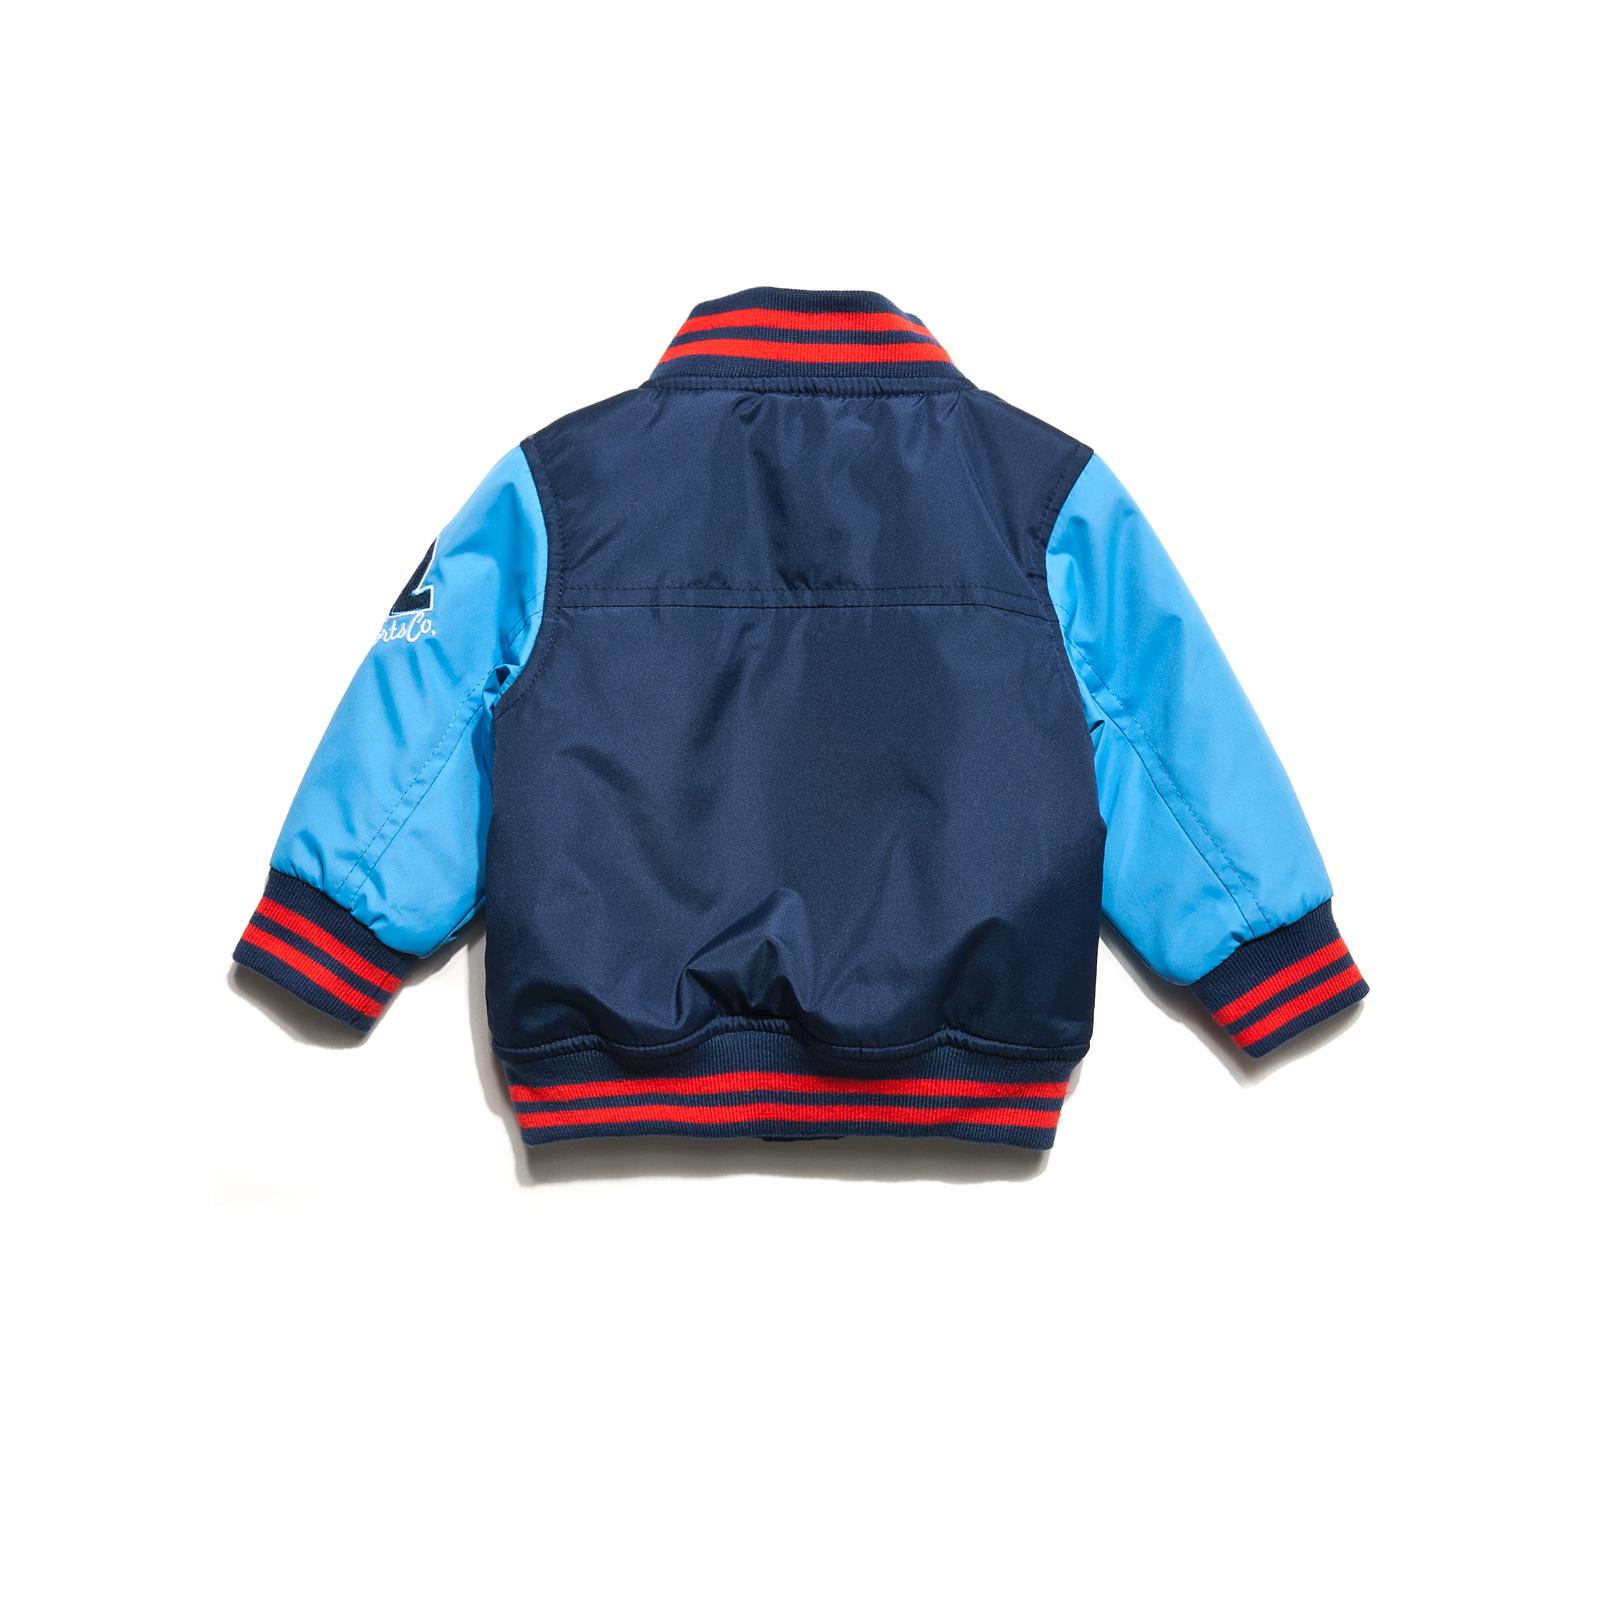 Куртка 5.10.15. Размер 74 от Младенец.ru